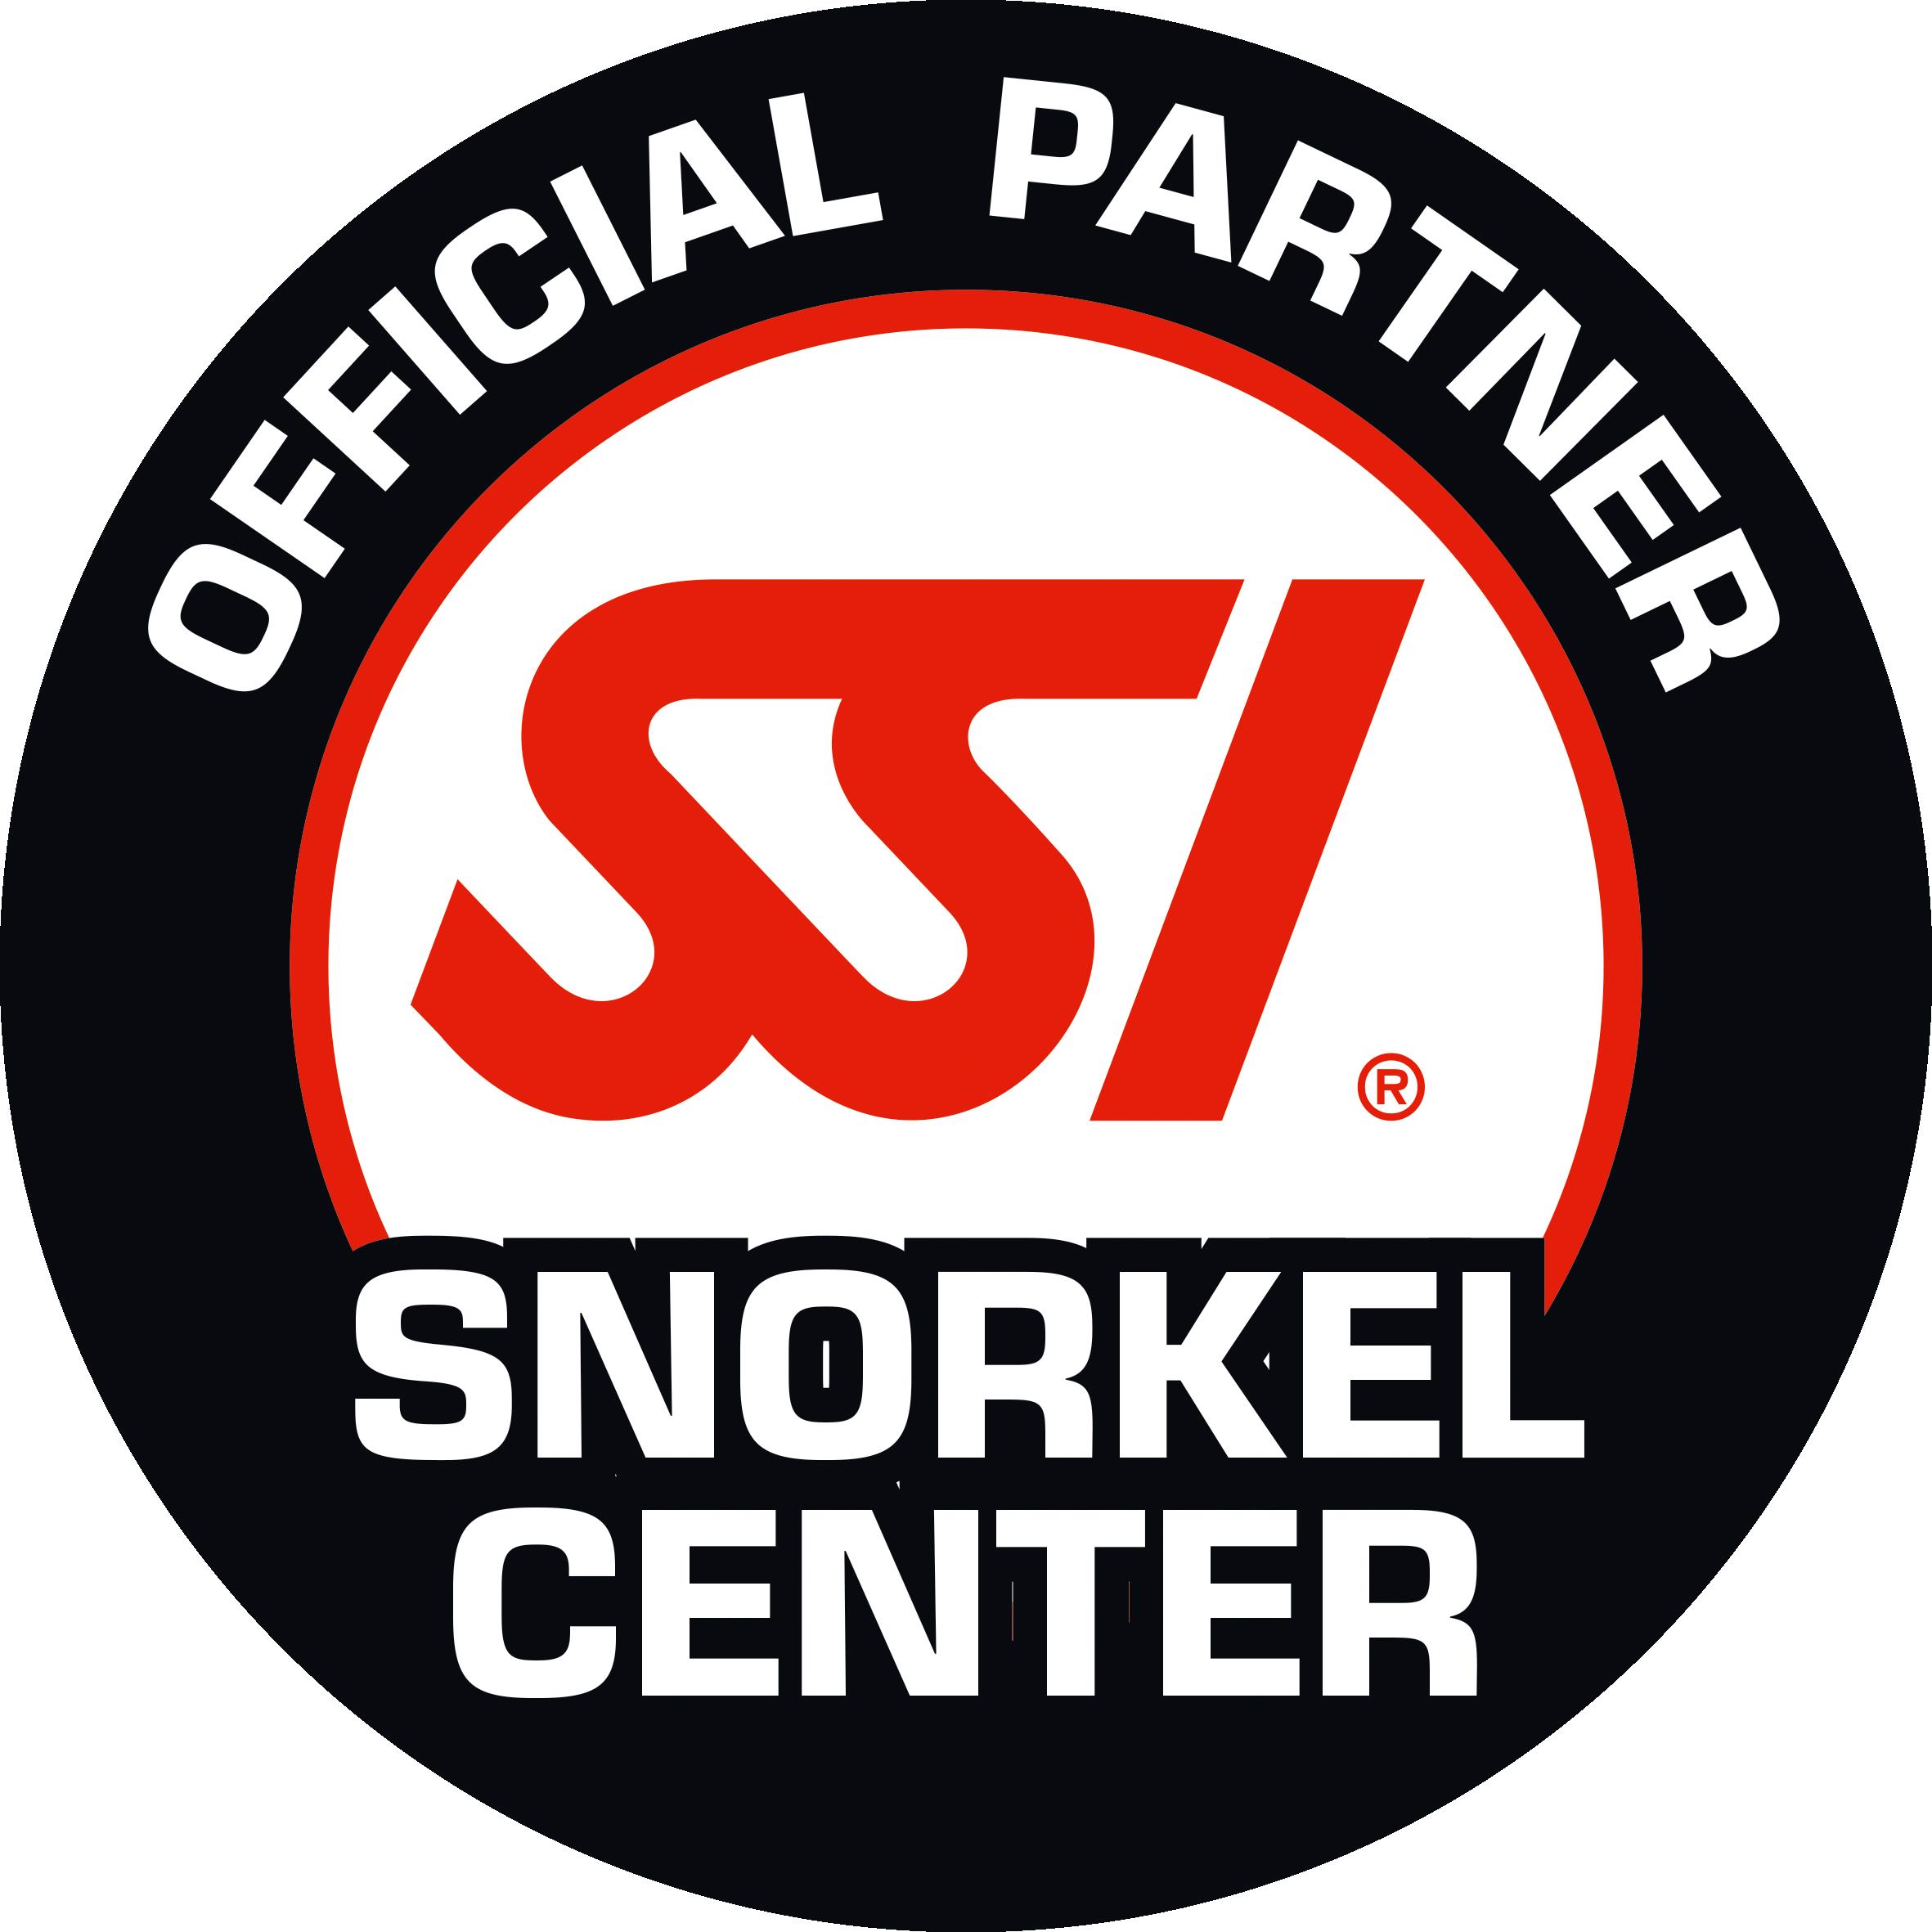 Snorkel Center